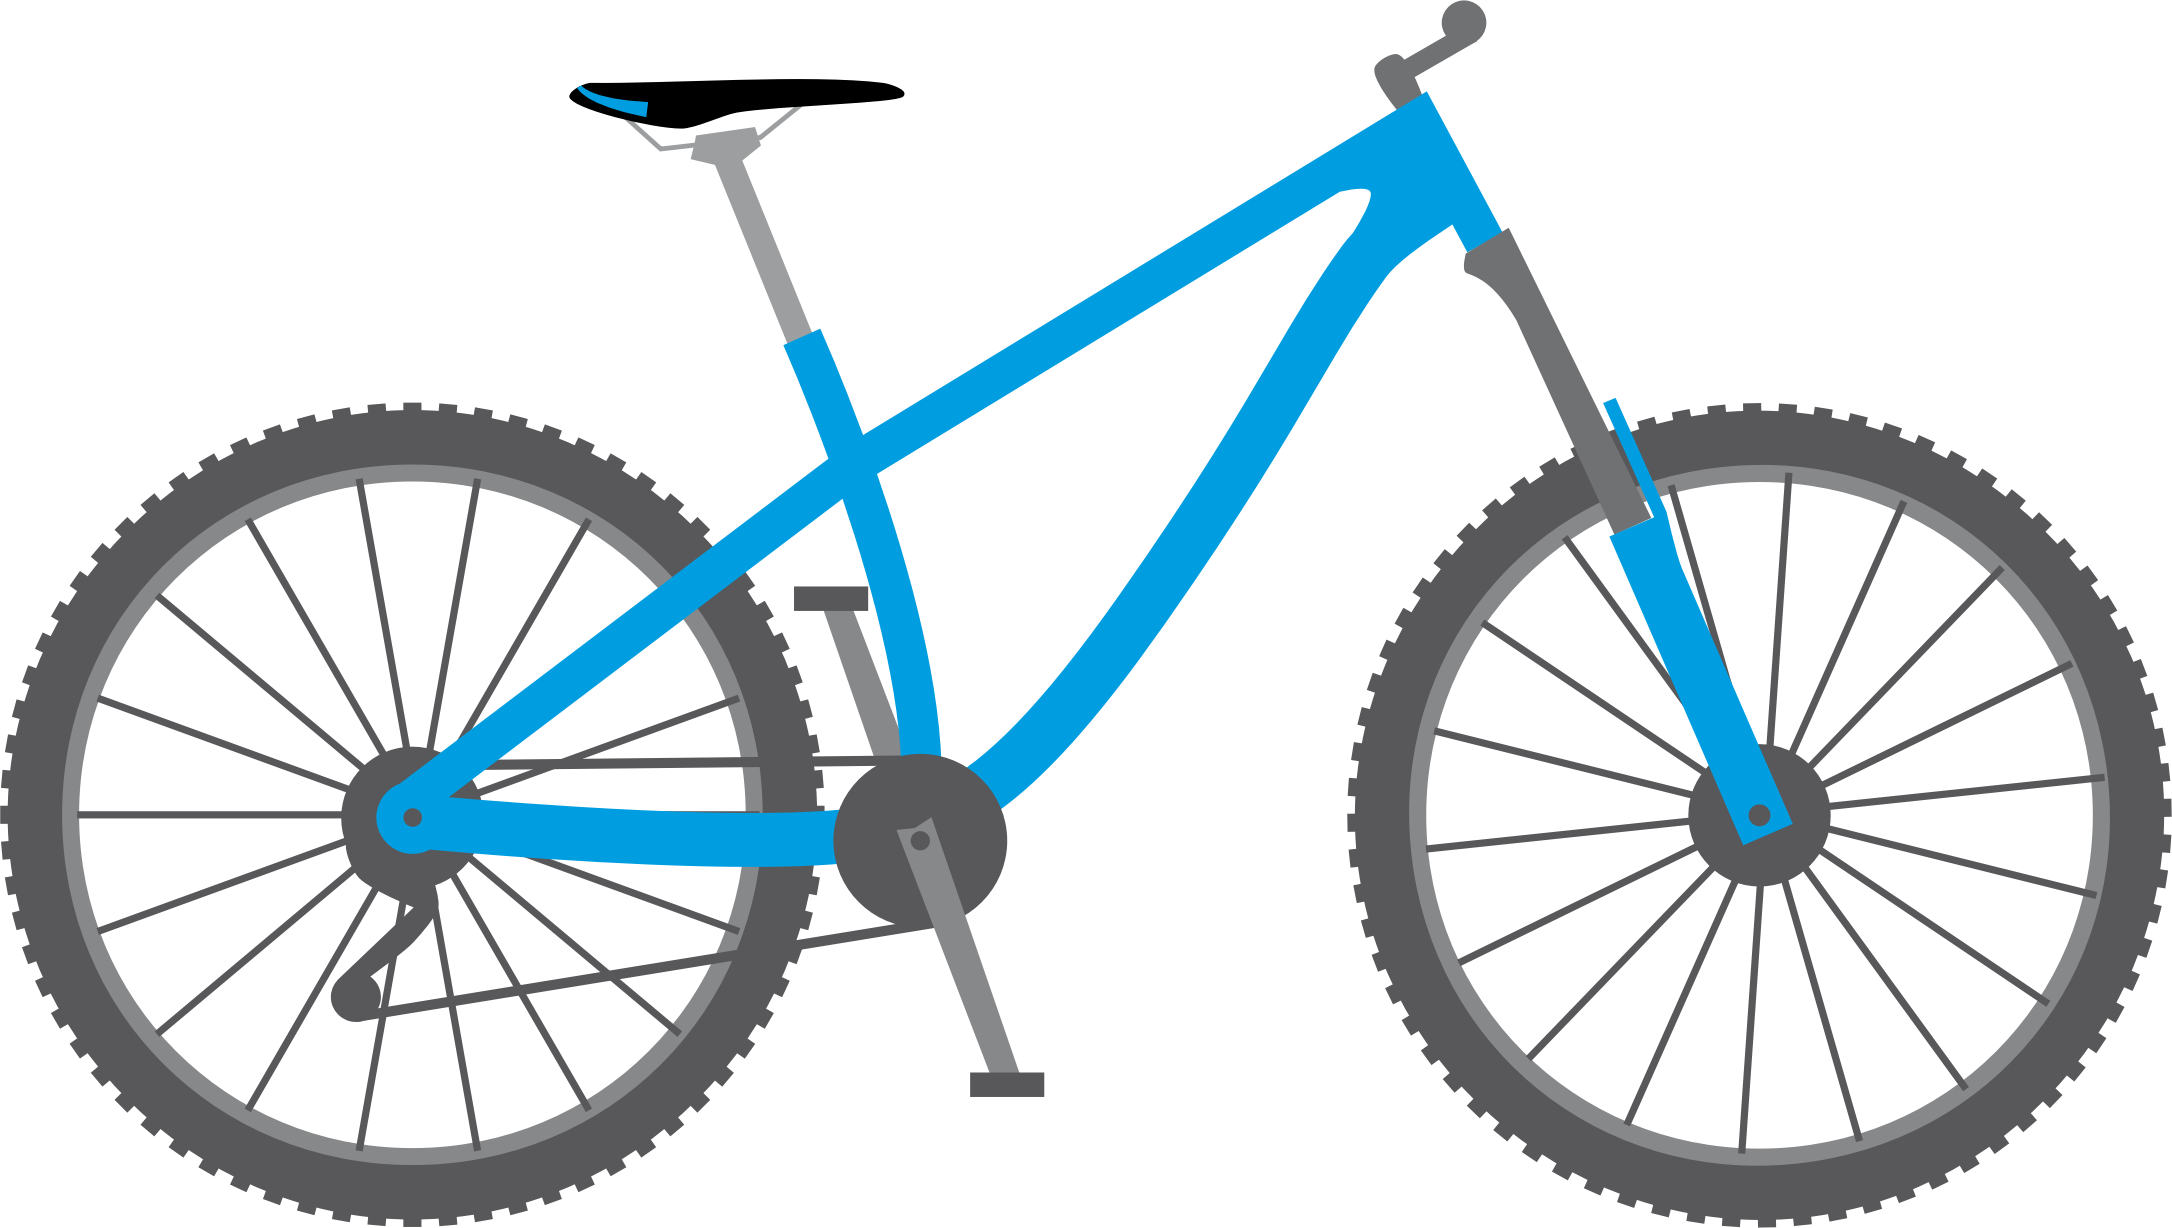 Bike non living thing